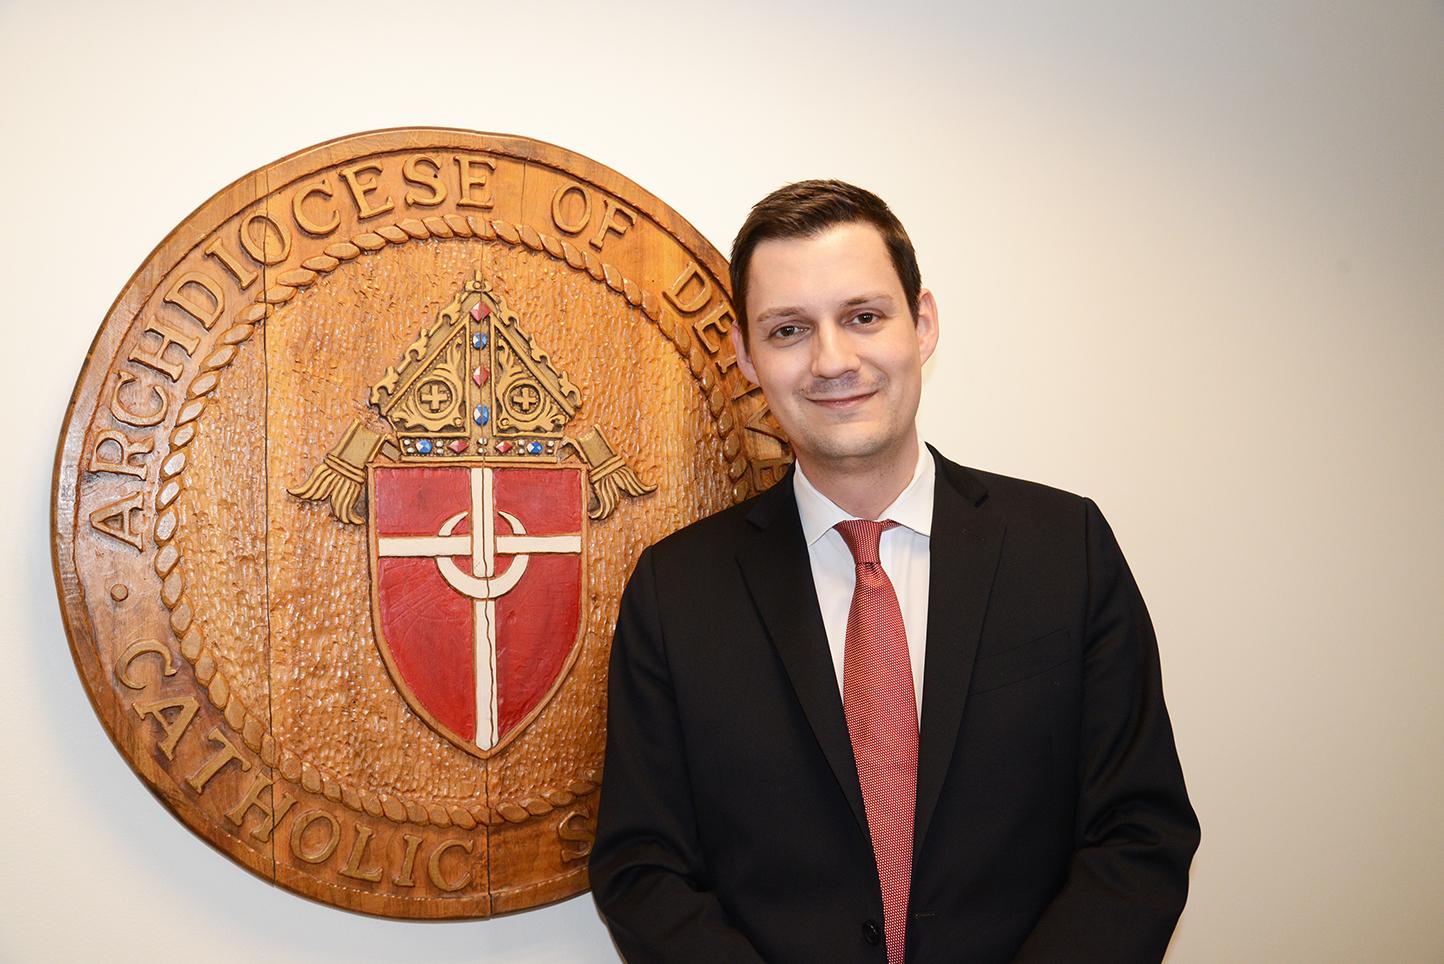 Archdiocese of Denver Announces Kevin Kijewski as New Superintendent